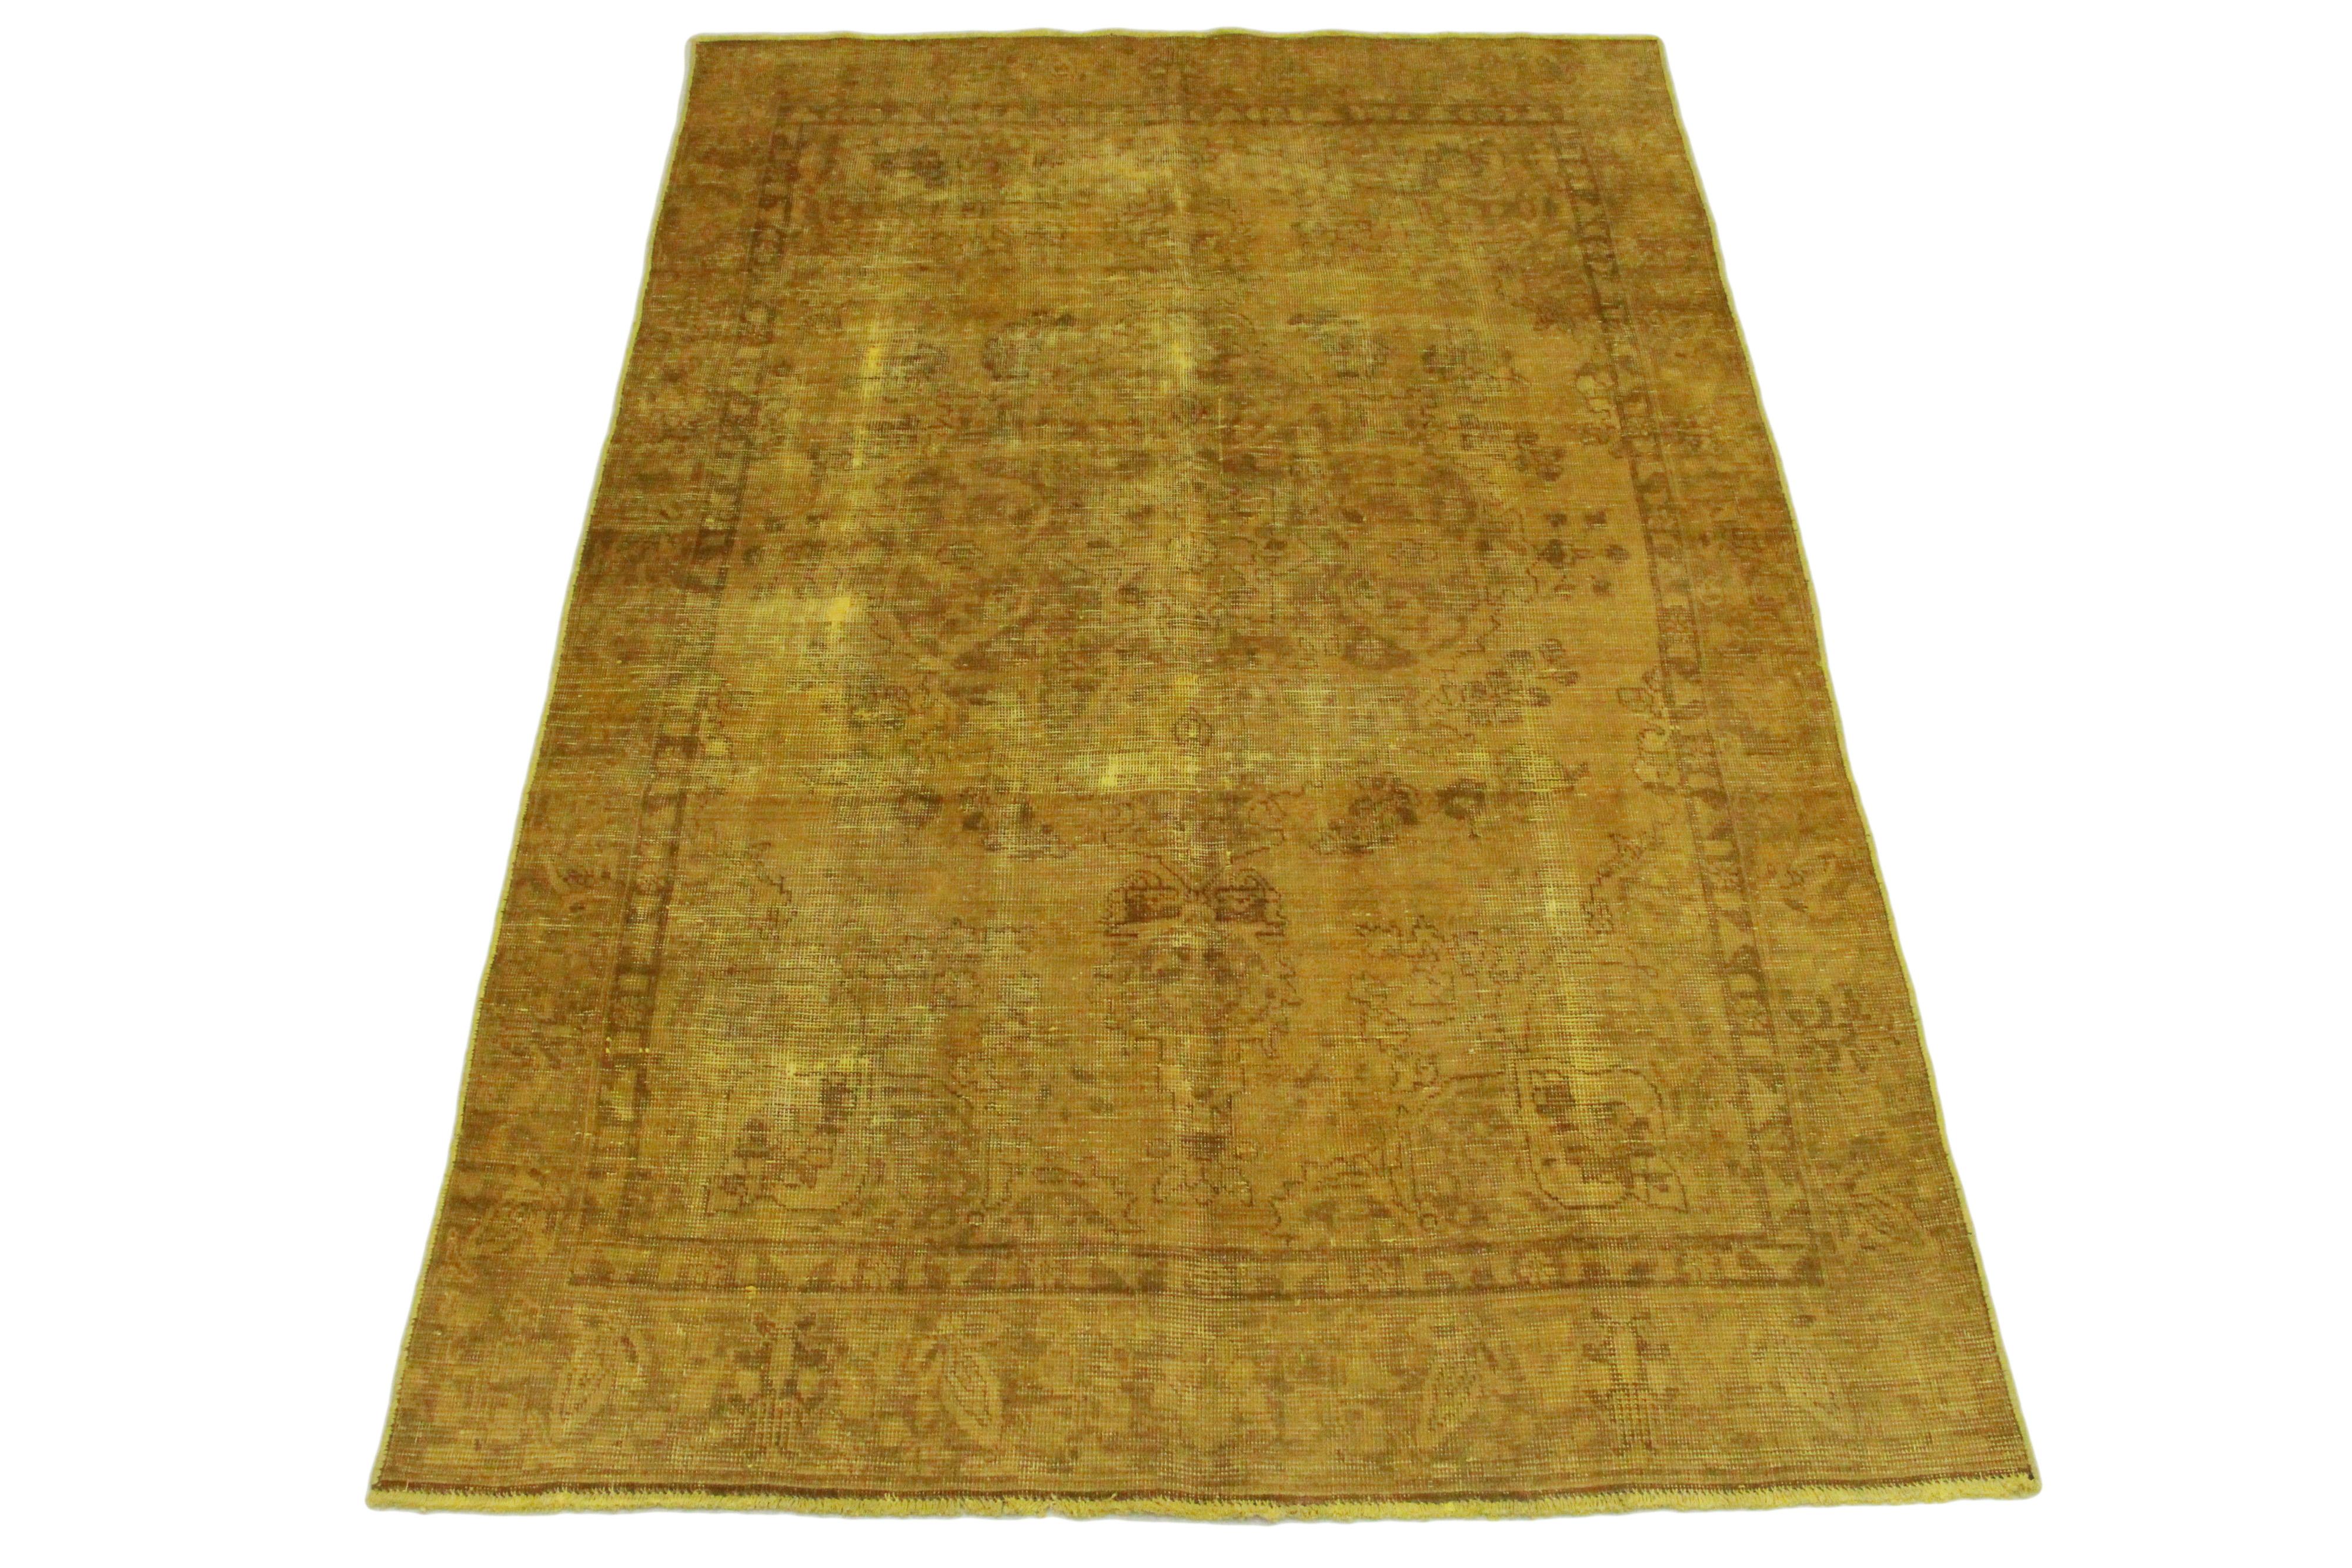 vintage teppich gold gelb in 270x180 1001 3494 bei. Black Bedroom Furniture Sets. Home Design Ideas